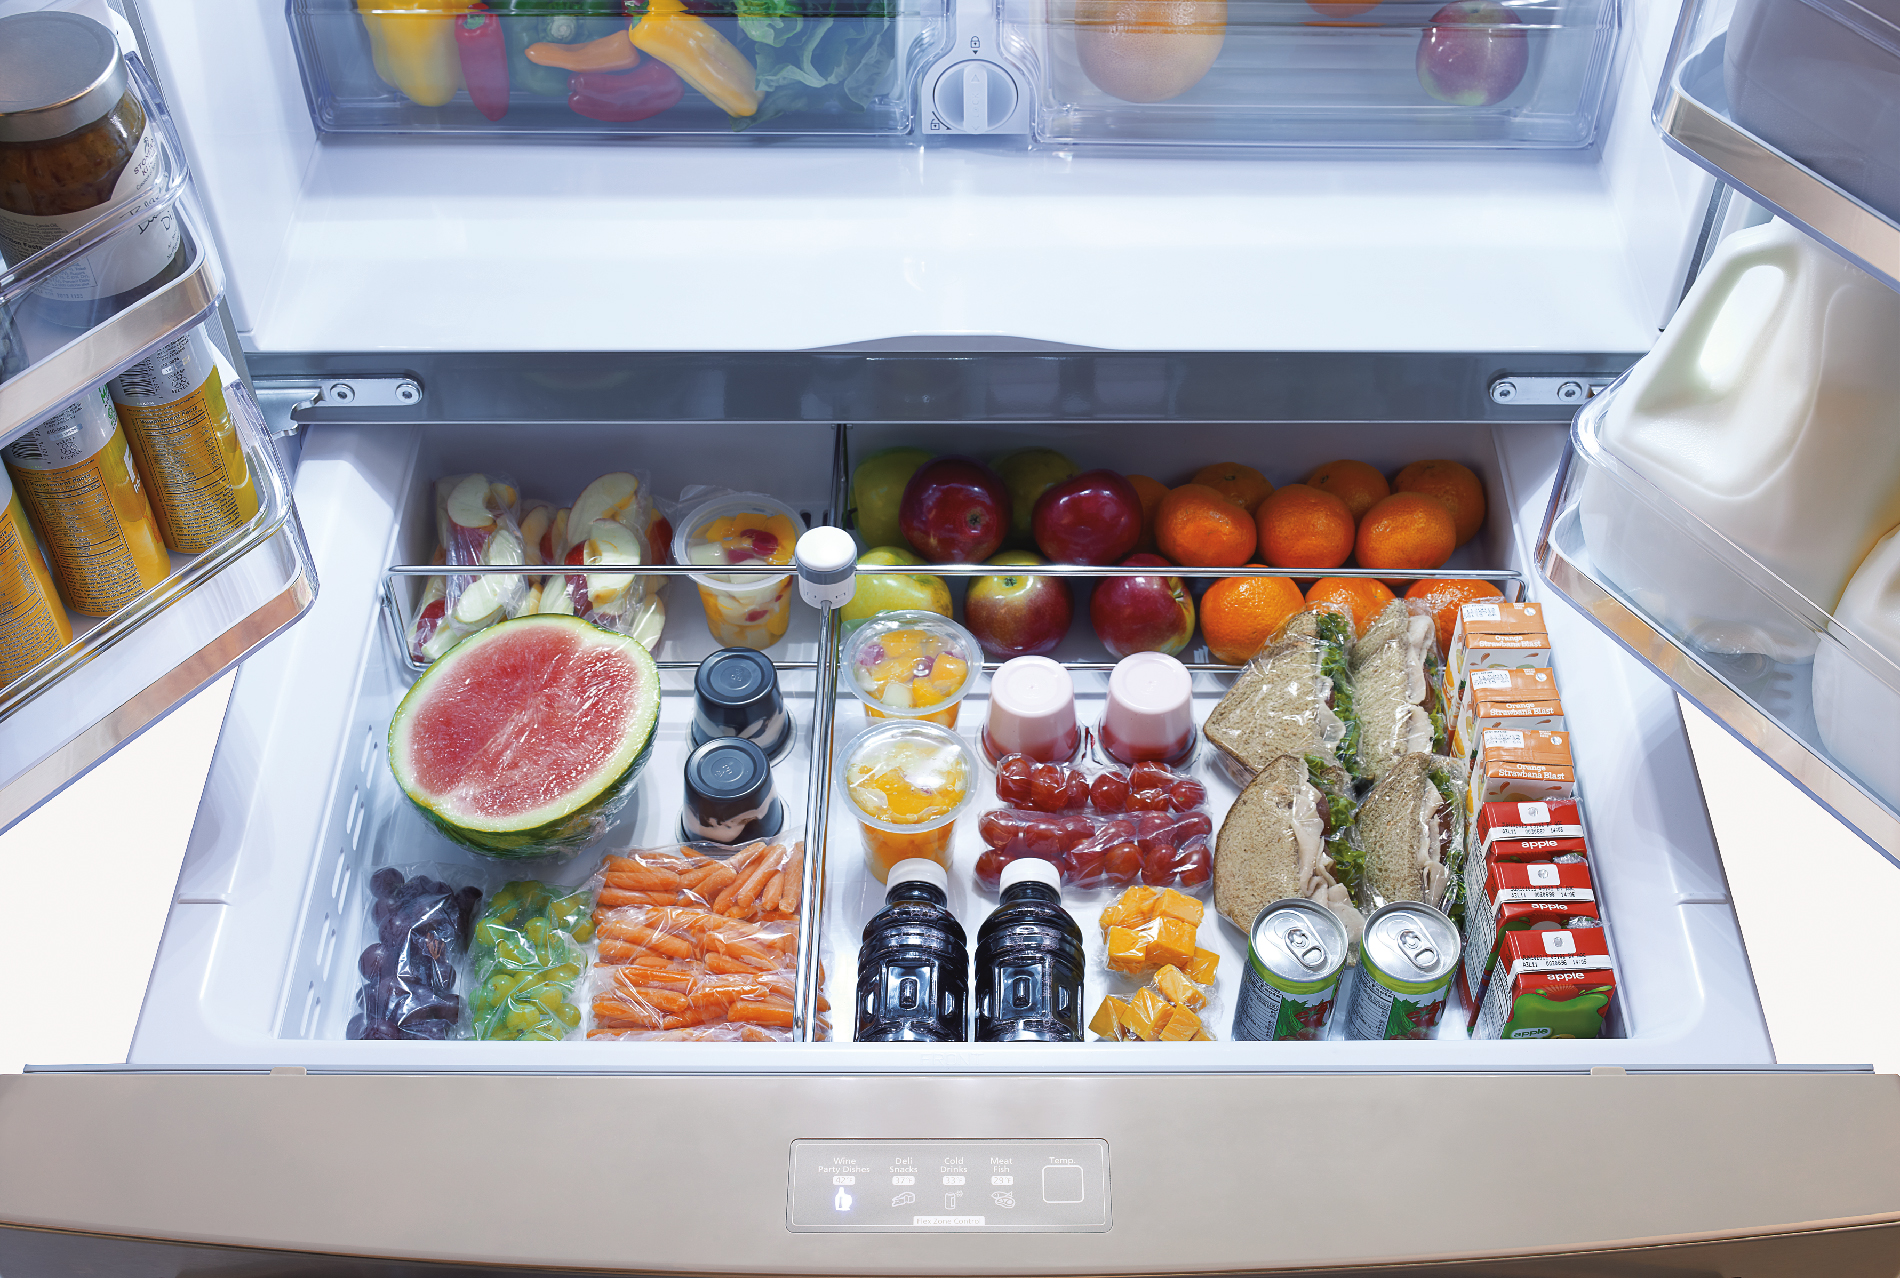 Samsung RF31FMESBSR 30.5 cu. ft. 4-Door Refrigerator w/ Automatic Sparkling Water Dispenser - Stainless Steel